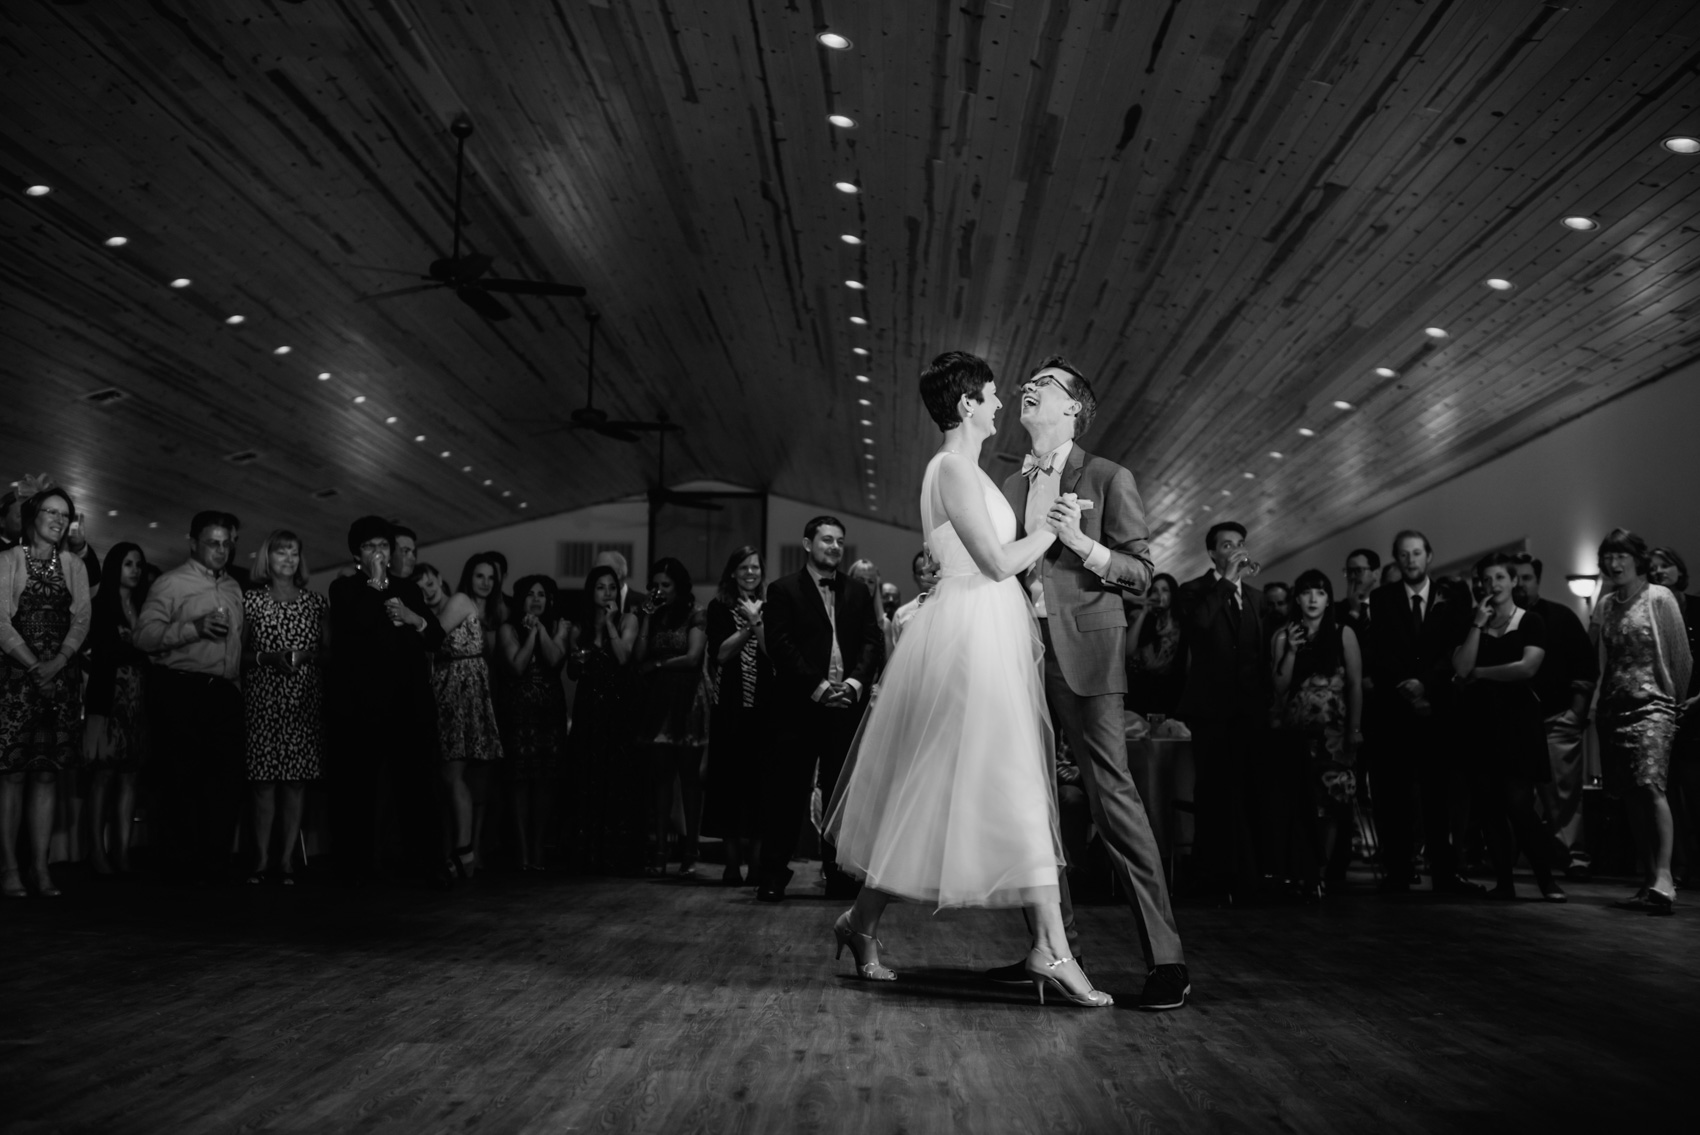 030-oberports-wedding-reception-portfolio